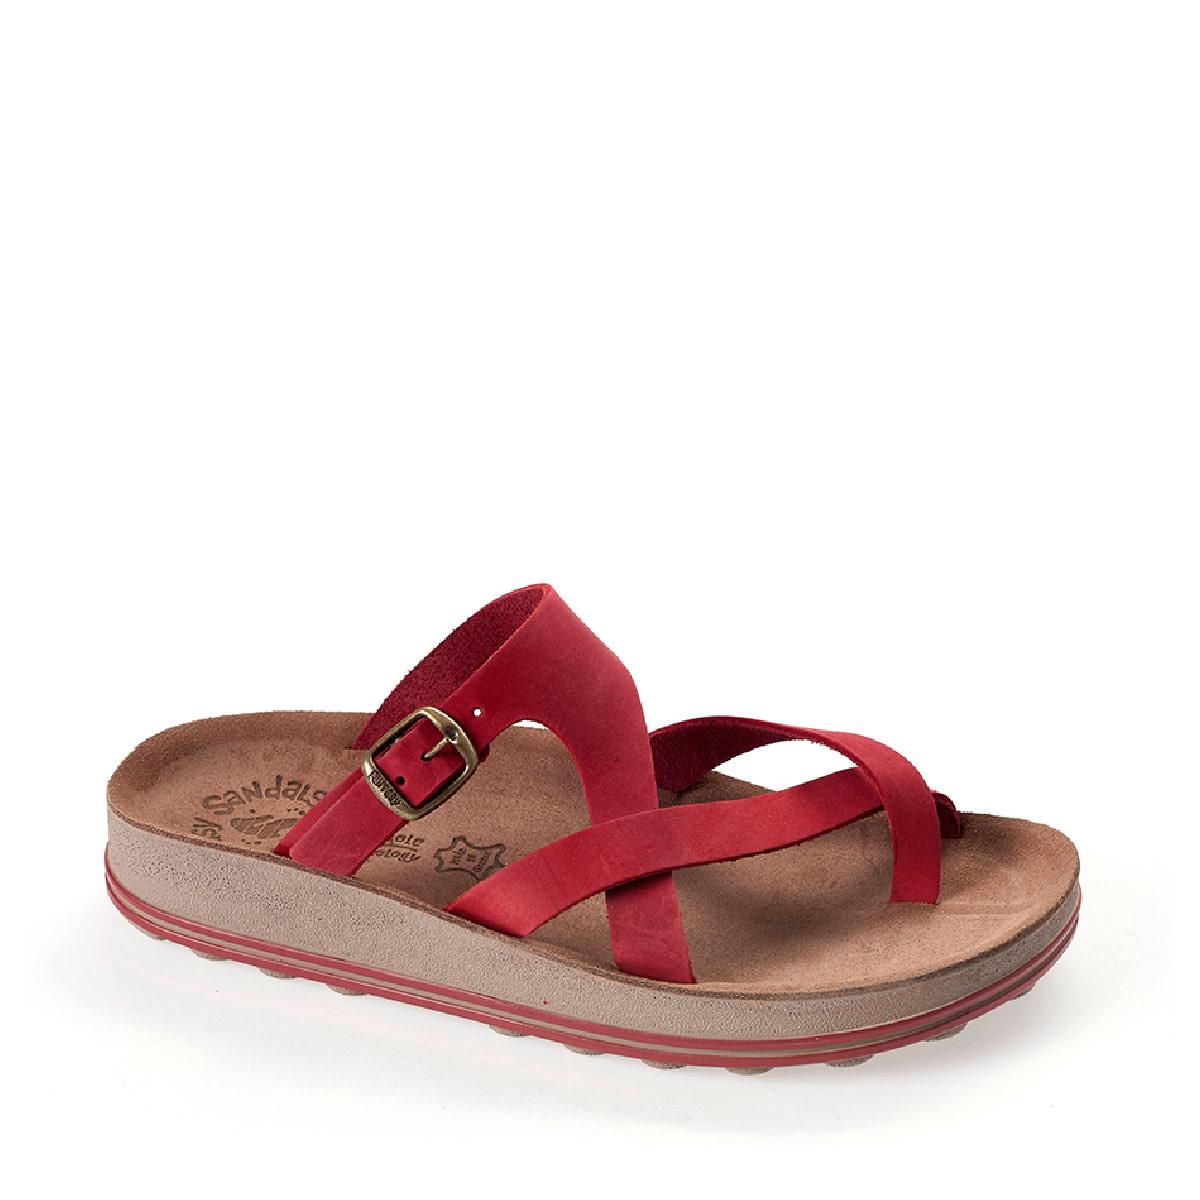 Fantasy Sandals Ariadni Red Brush